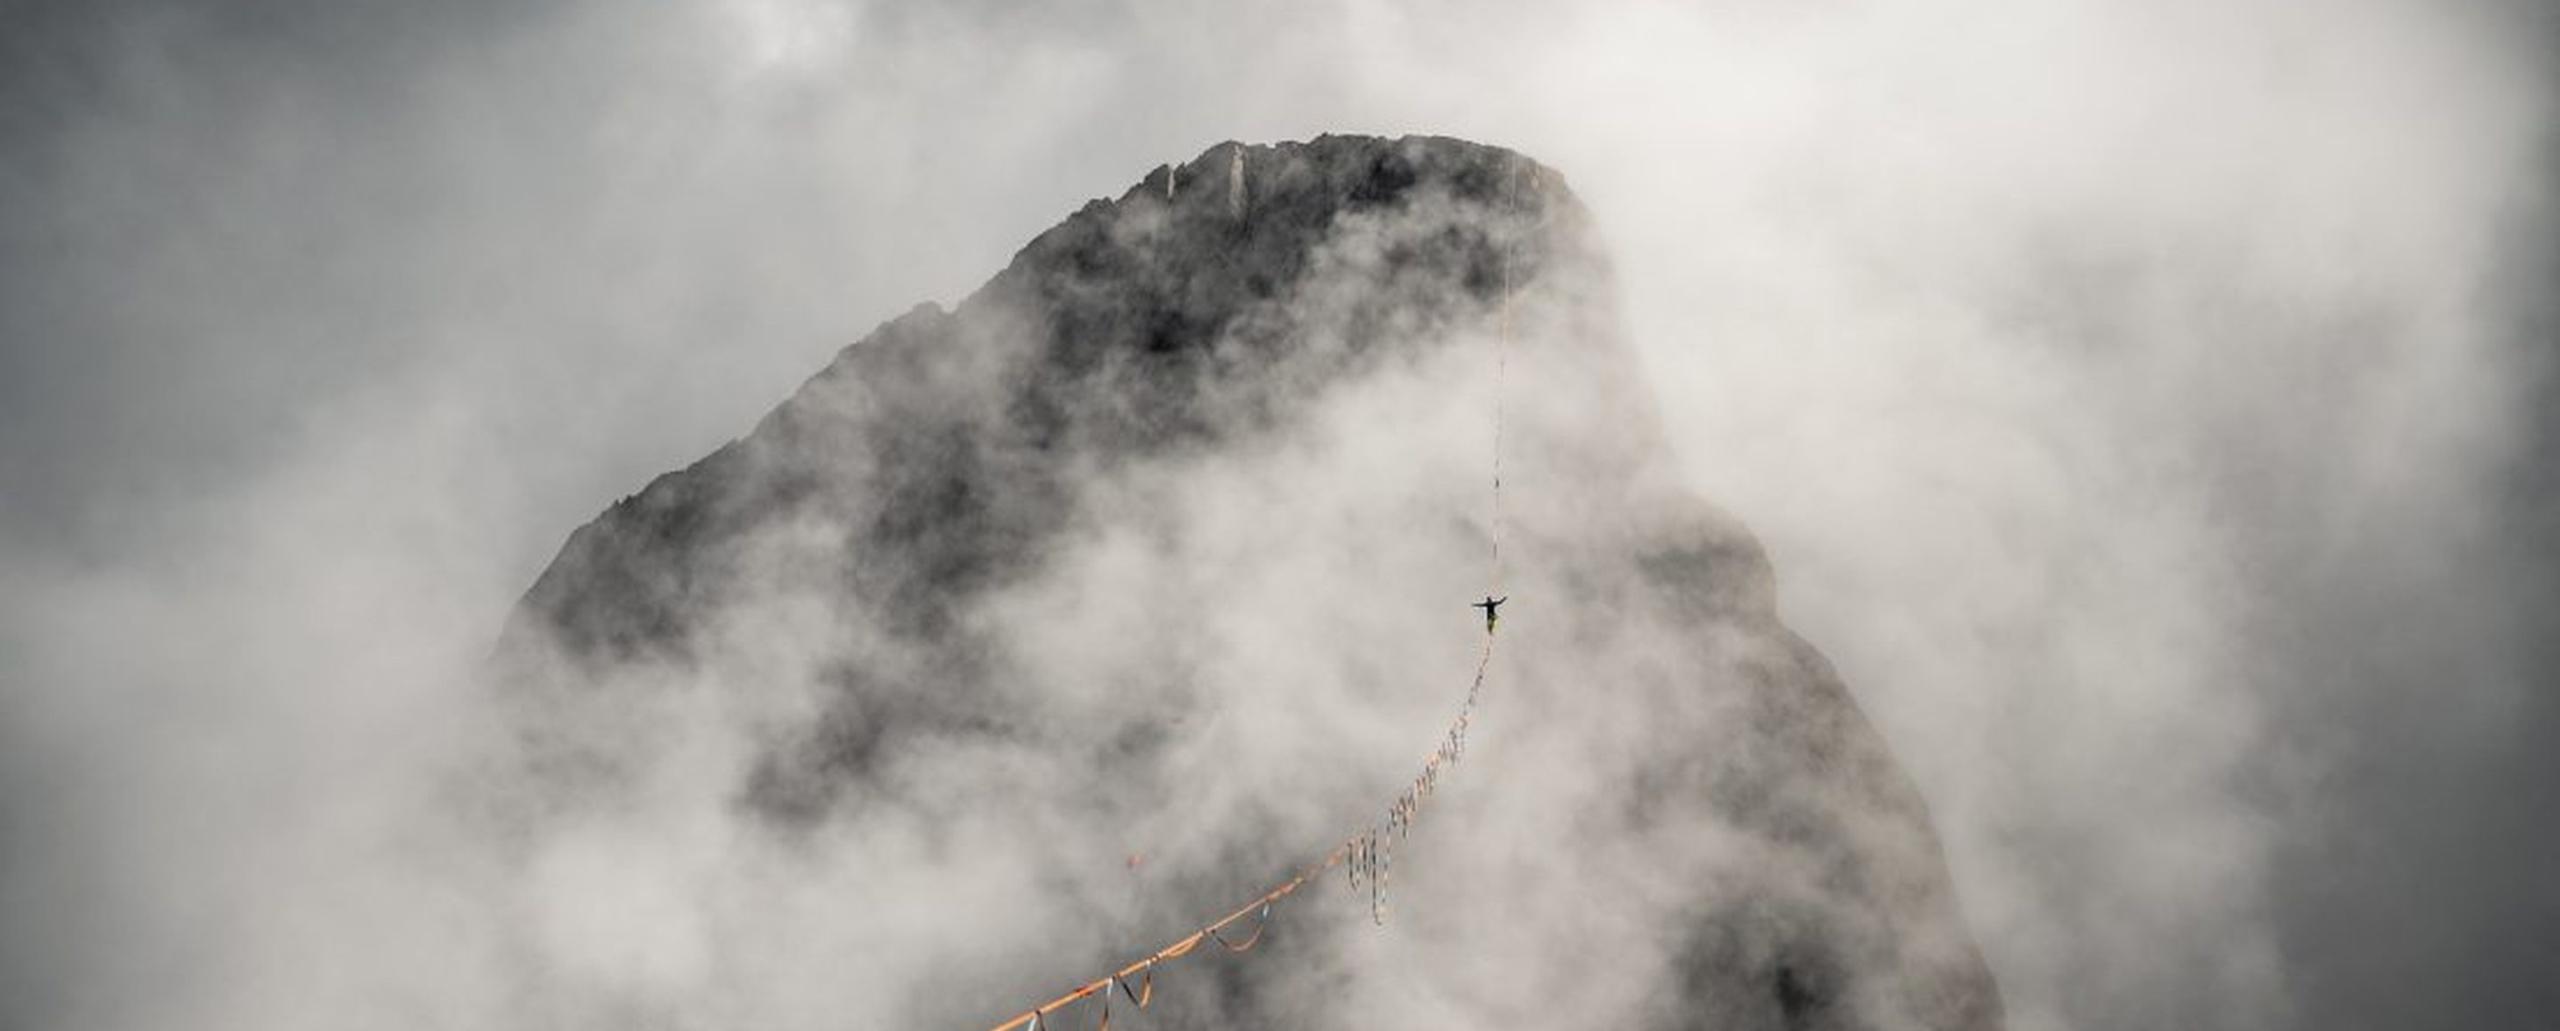 Antoine Mesnage Esprit outdoor Highline